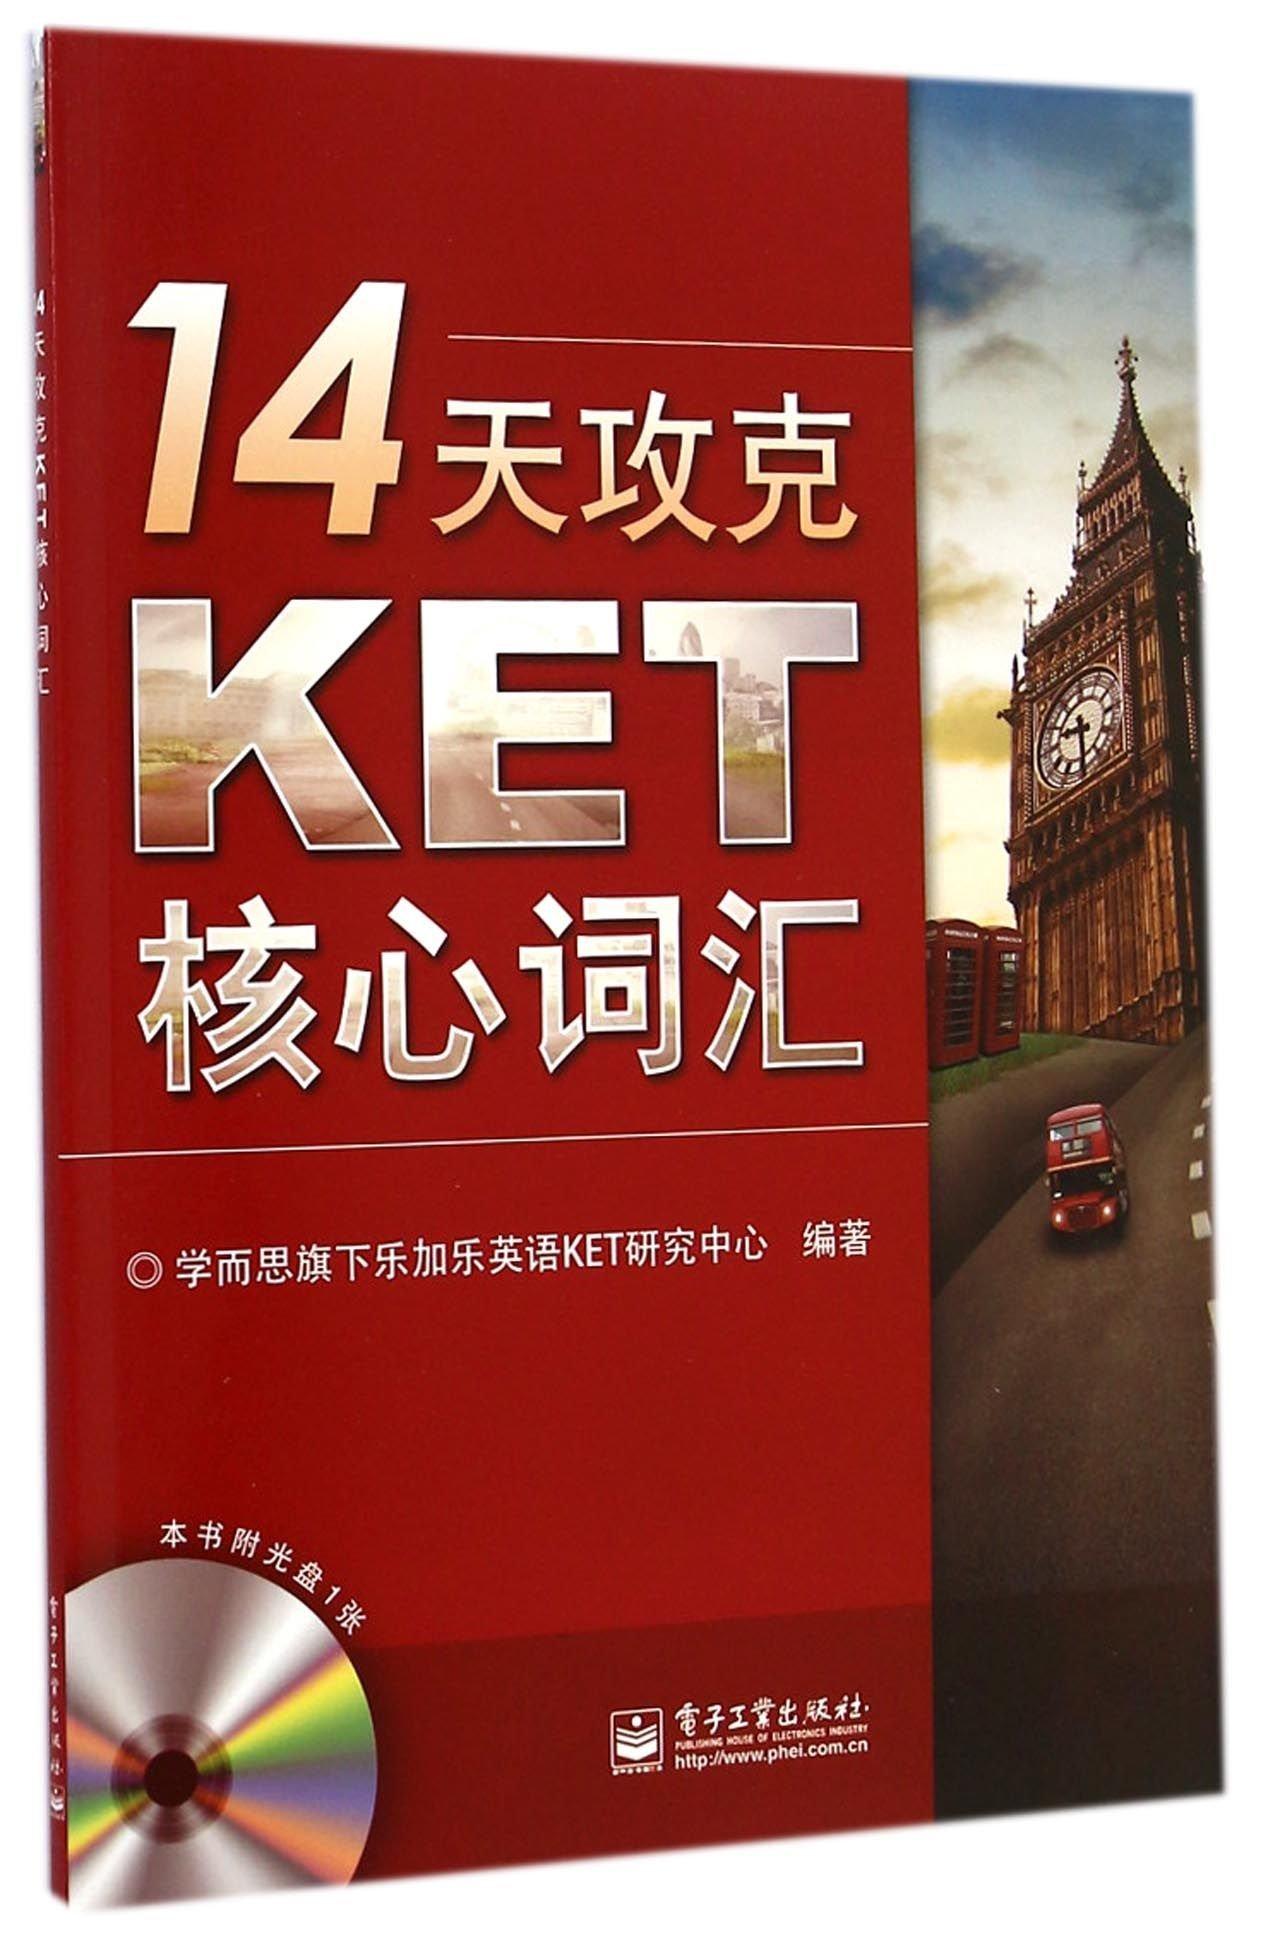 Download 14天攻克KET核心词汇(附CD光盘1张) PDF ePub fb2 book